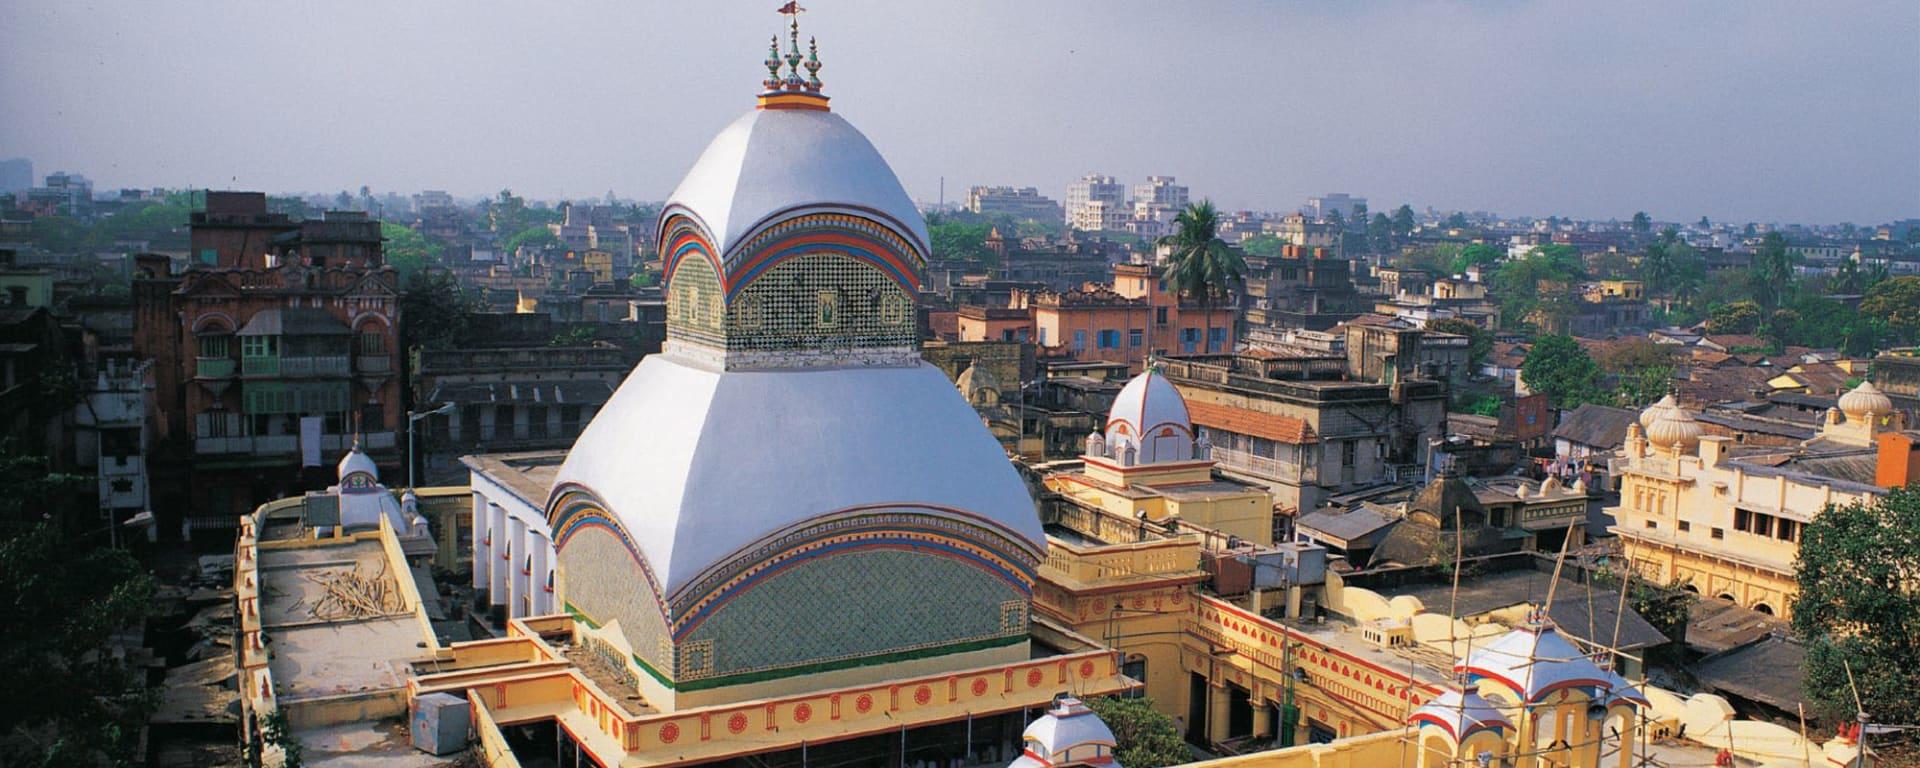 Stadttour Kolkata: Kali Ghat Temple Kolkata